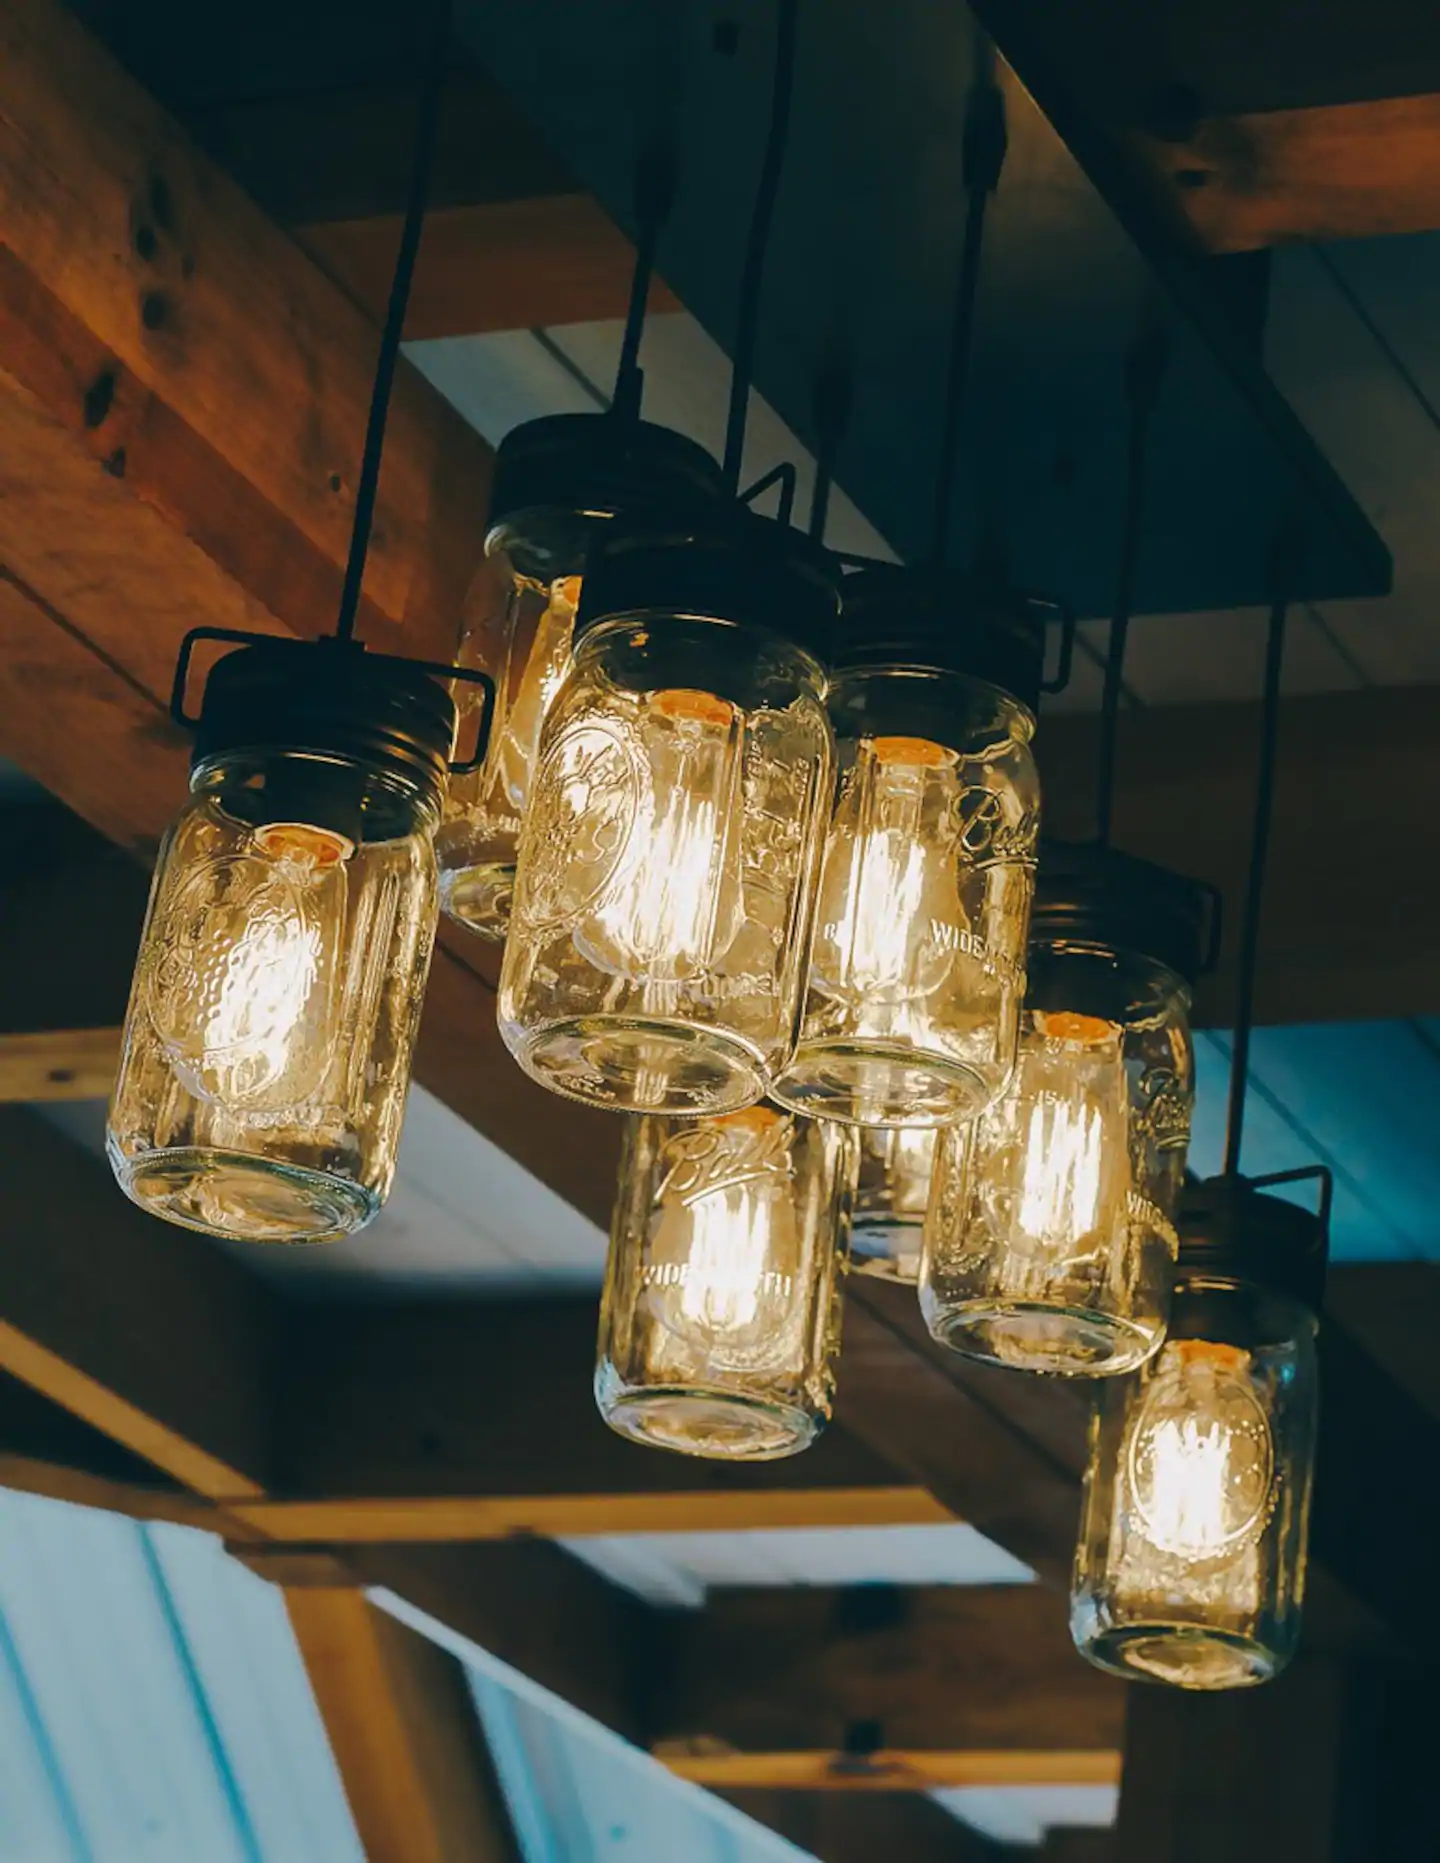 Tennessee Cider Company's Airbnb mason jar lodge lights